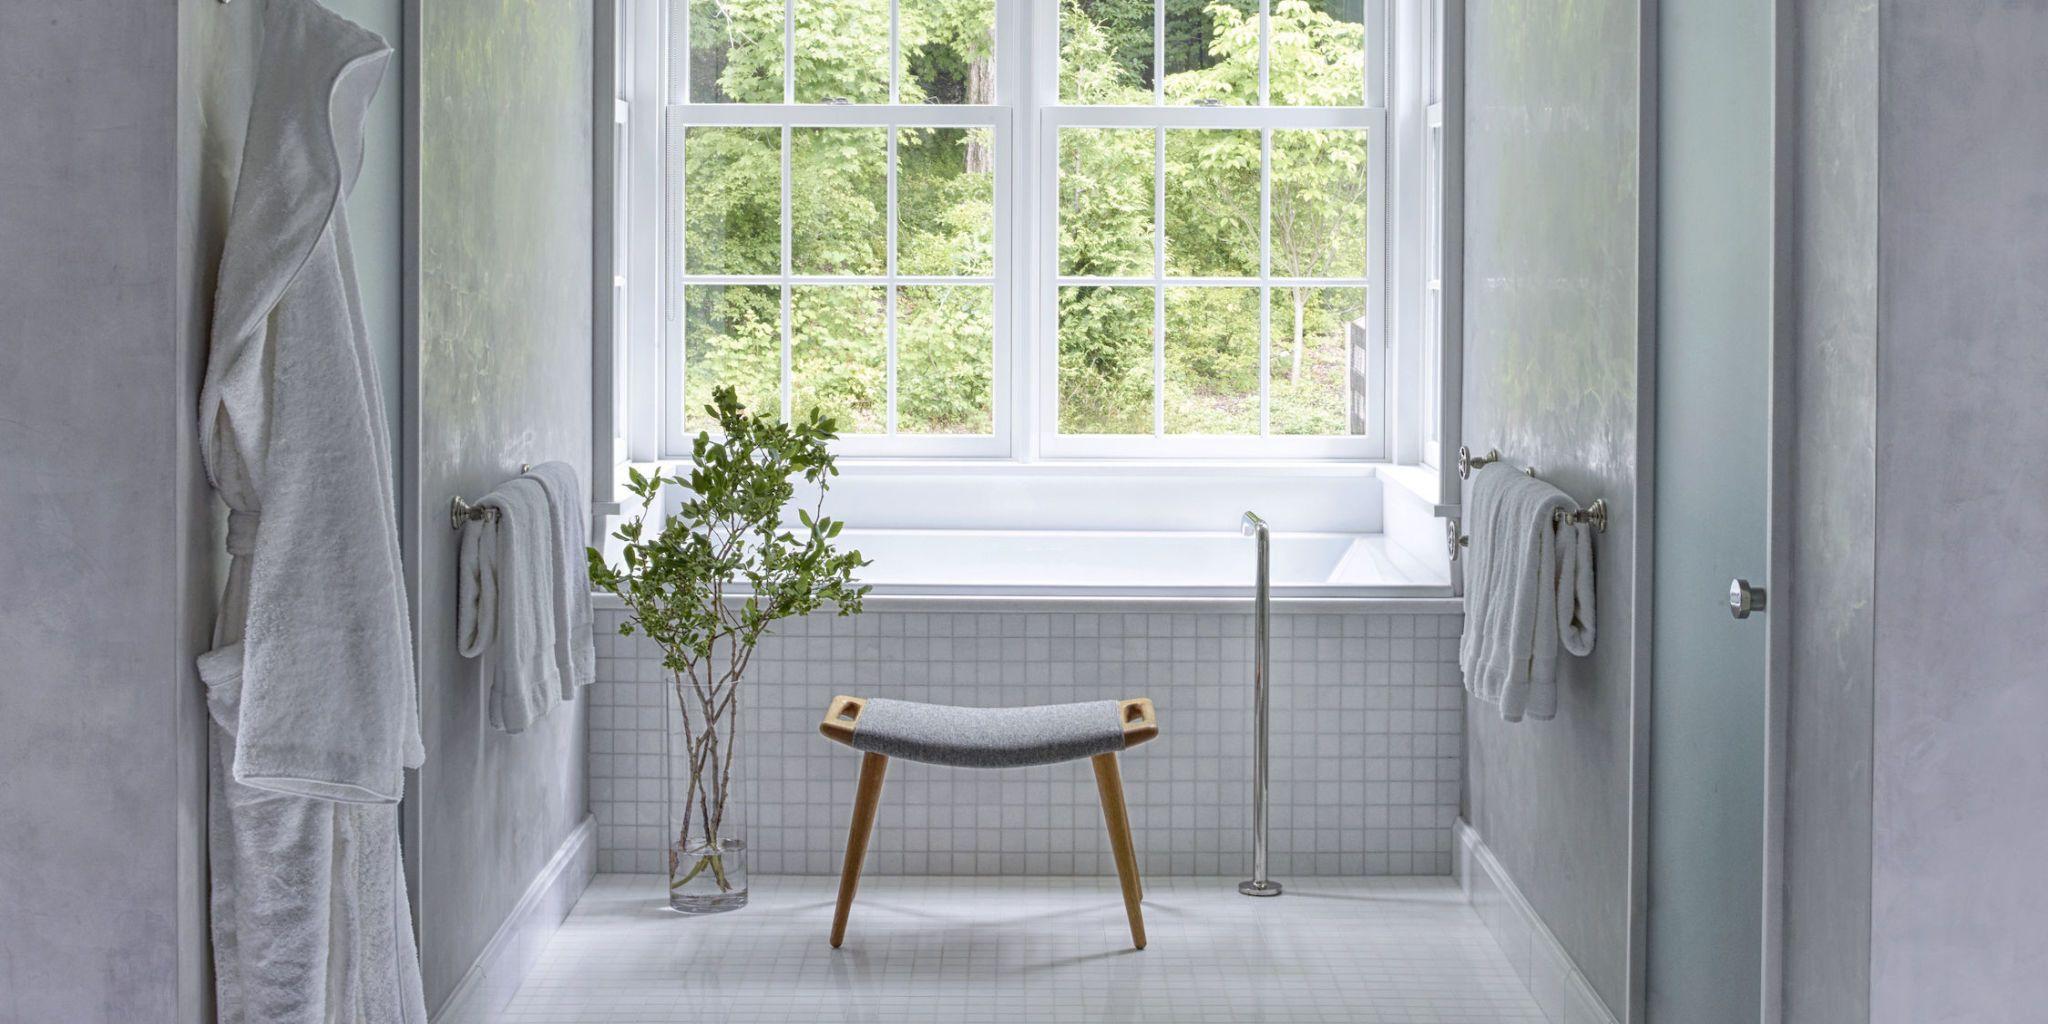 white bathrooms & 25 White Bathroom Design Ideas - Decorating Tips for All White Bathrooms